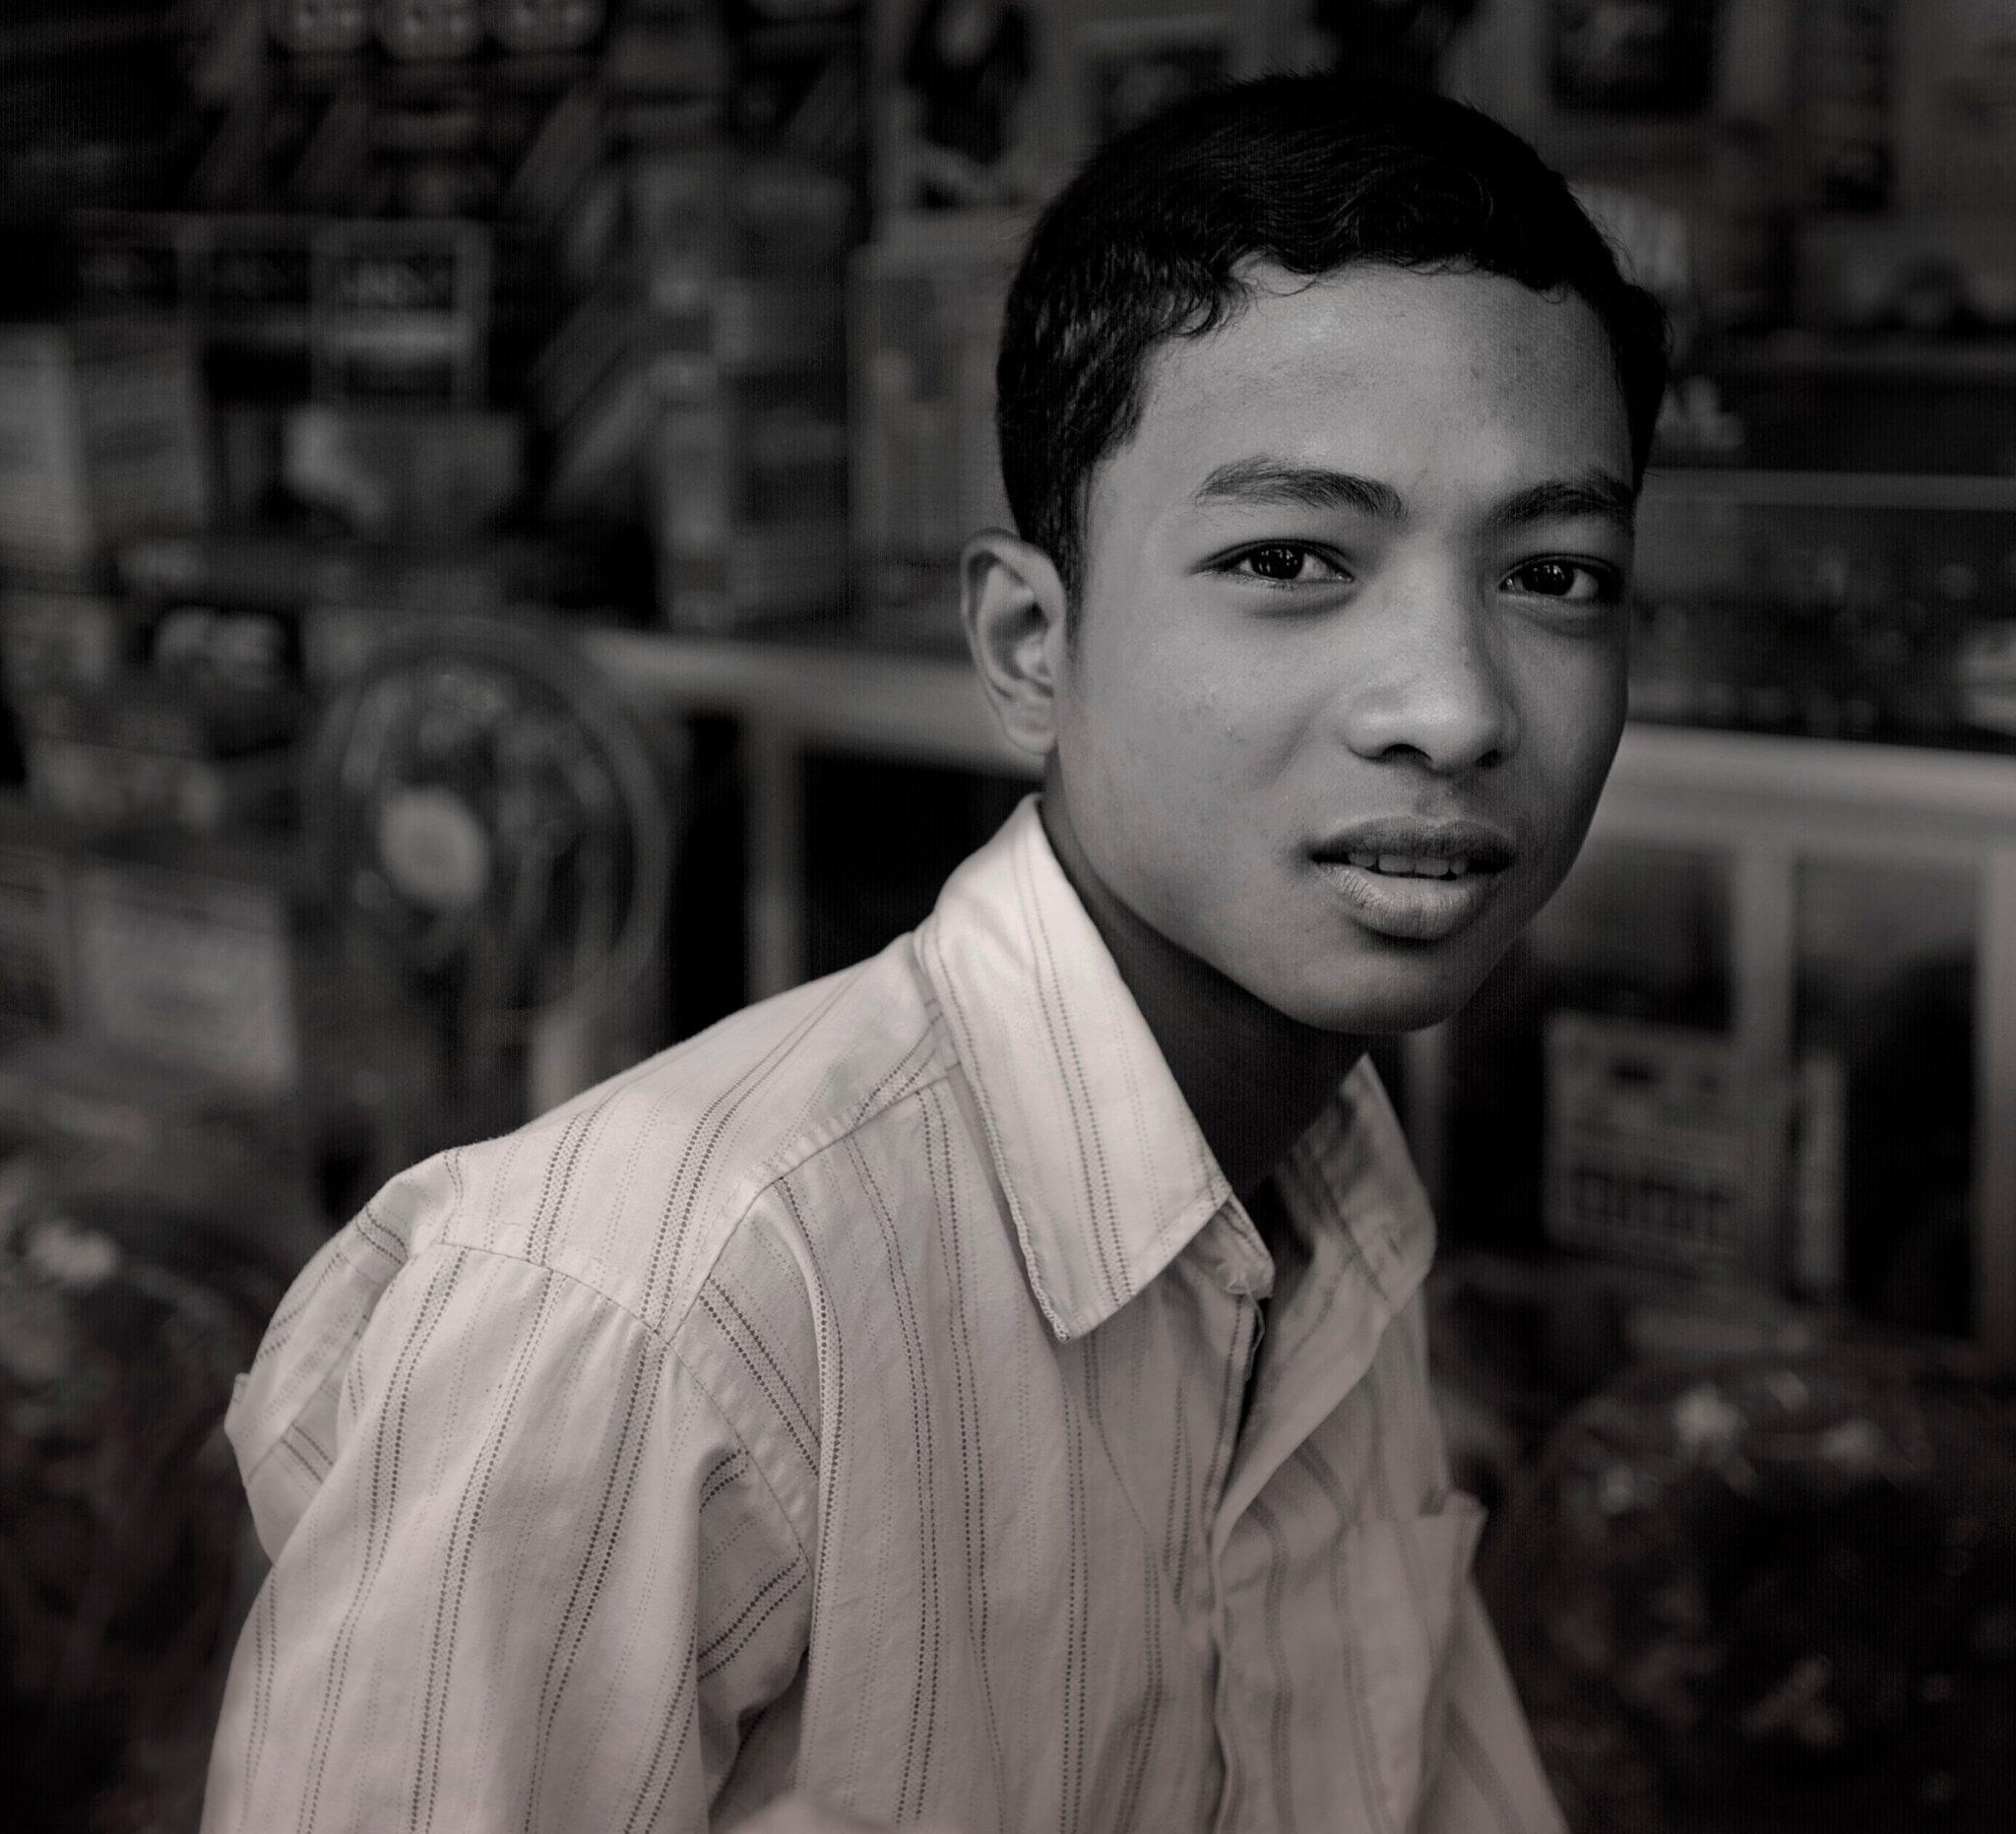 Young Visayan Man in a Strange World